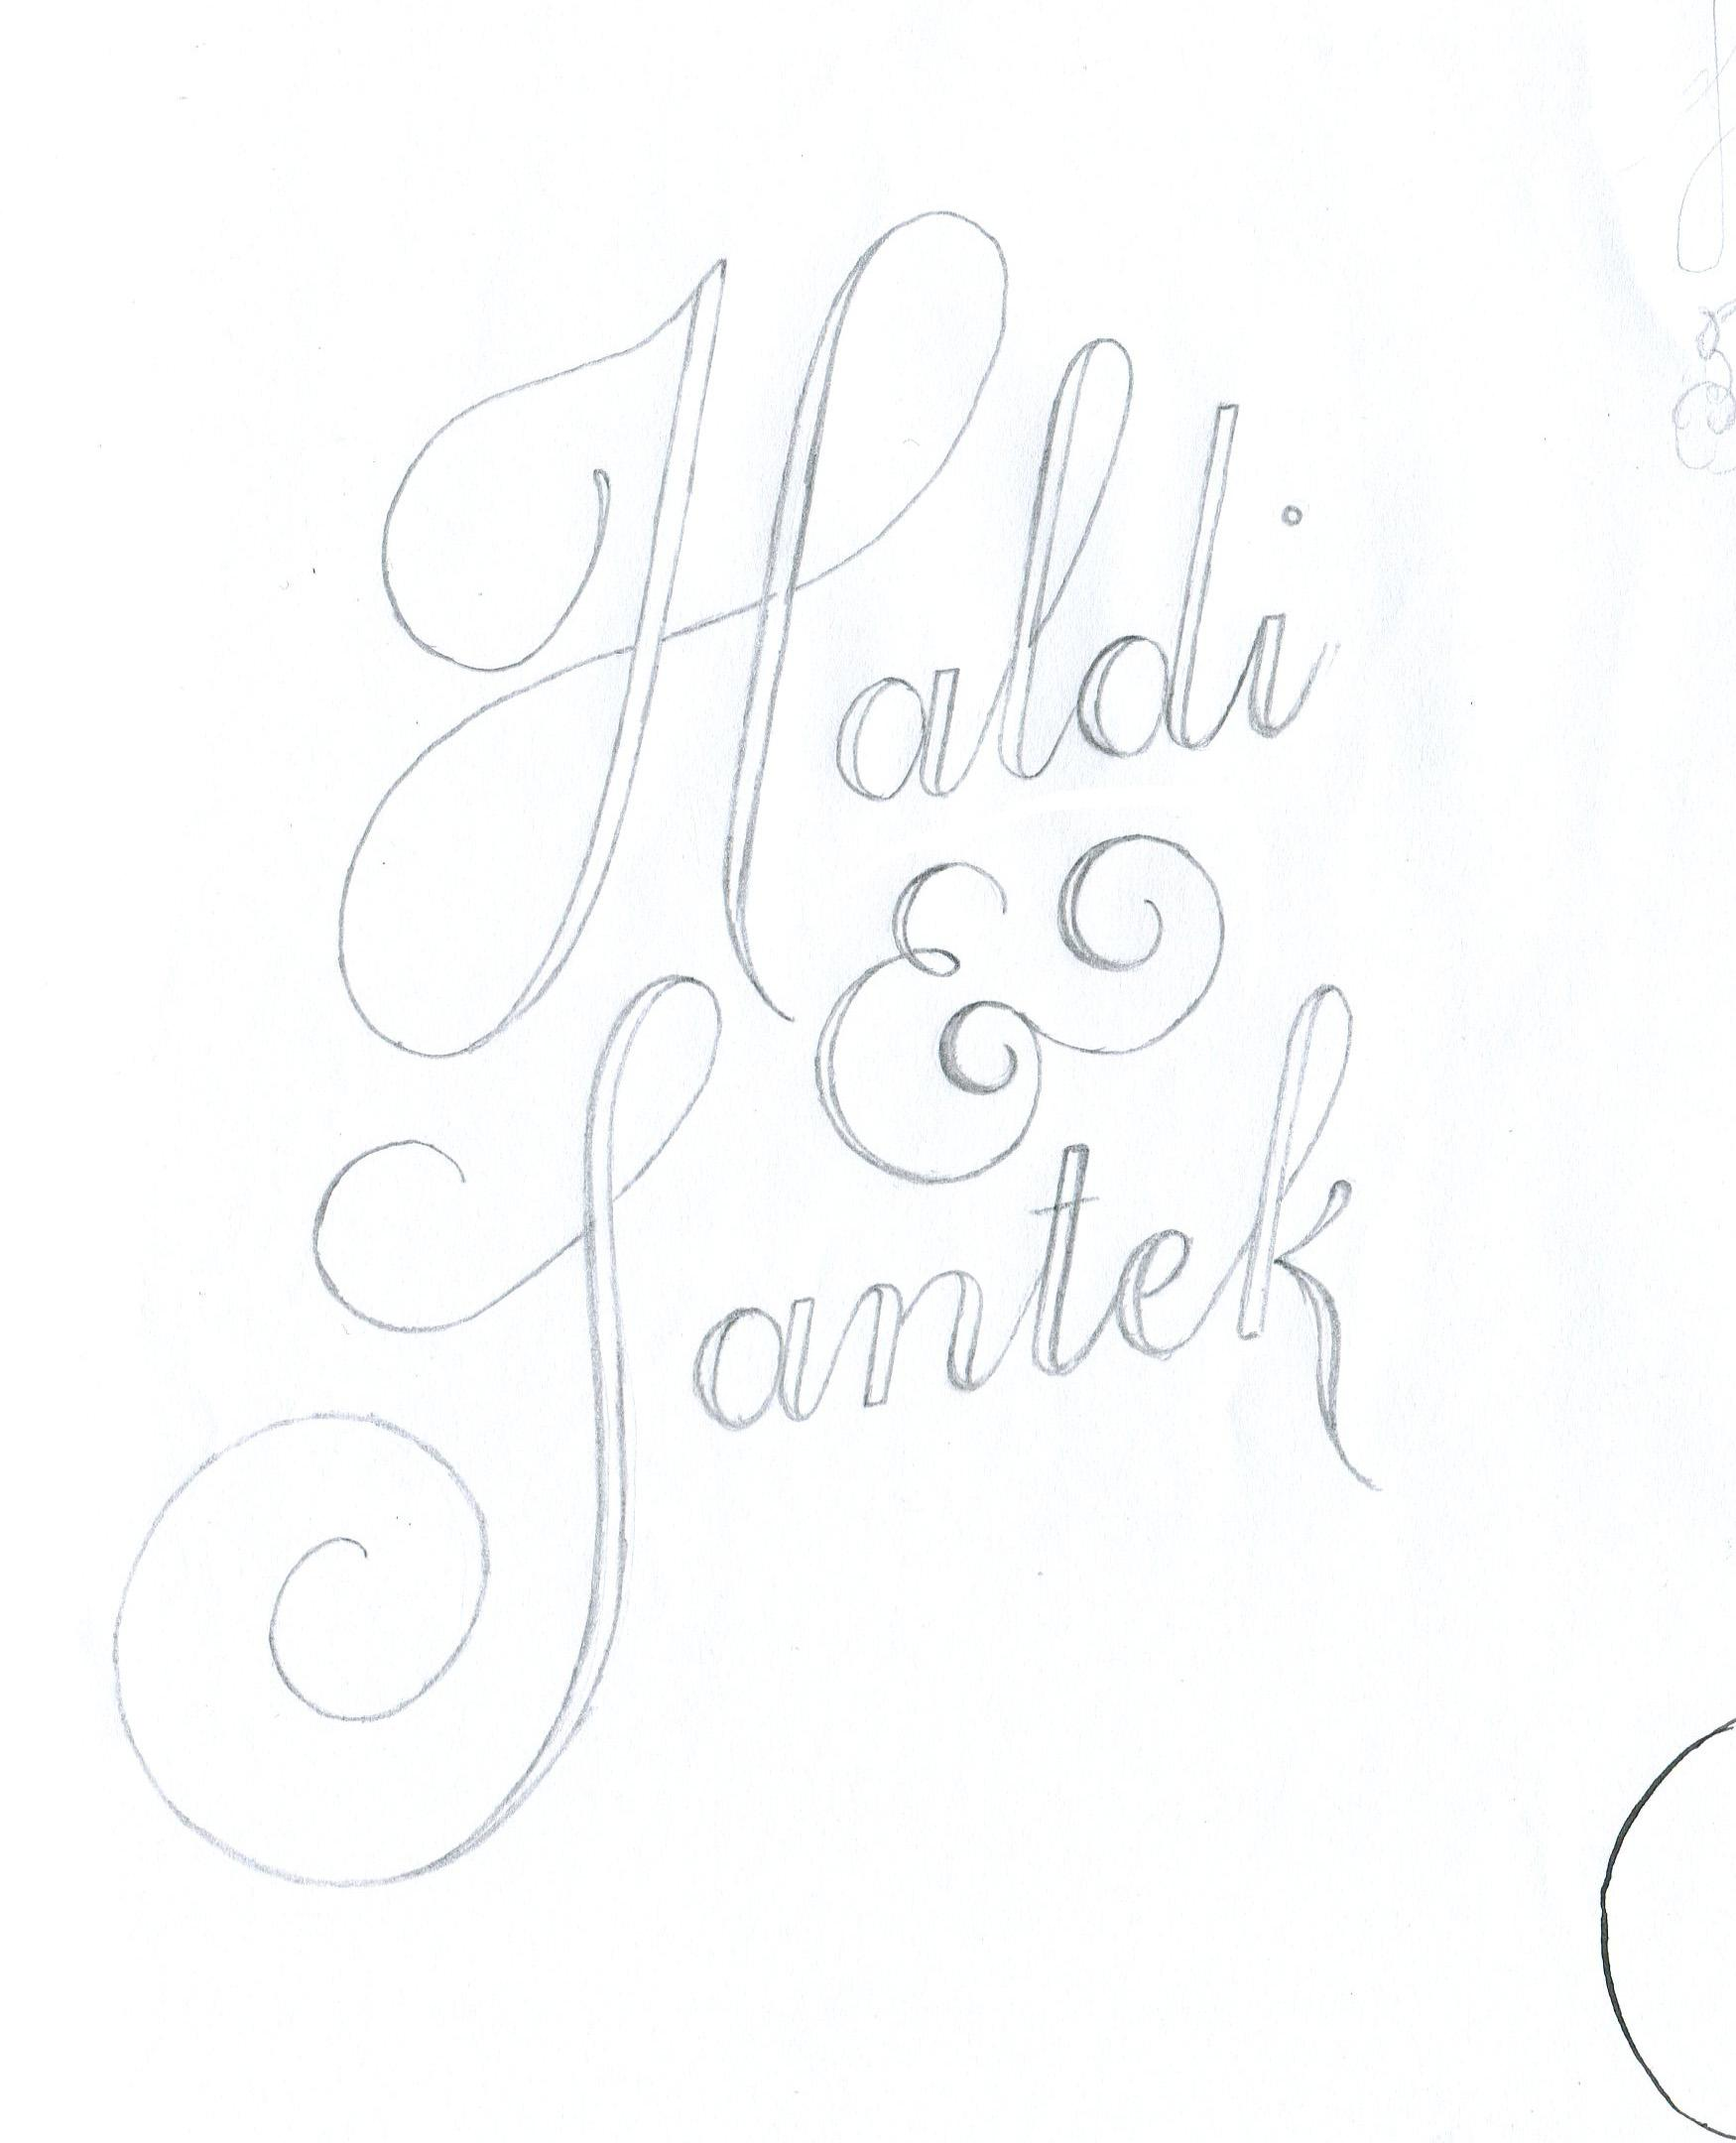 Haldi & Santek - image 5 - student project